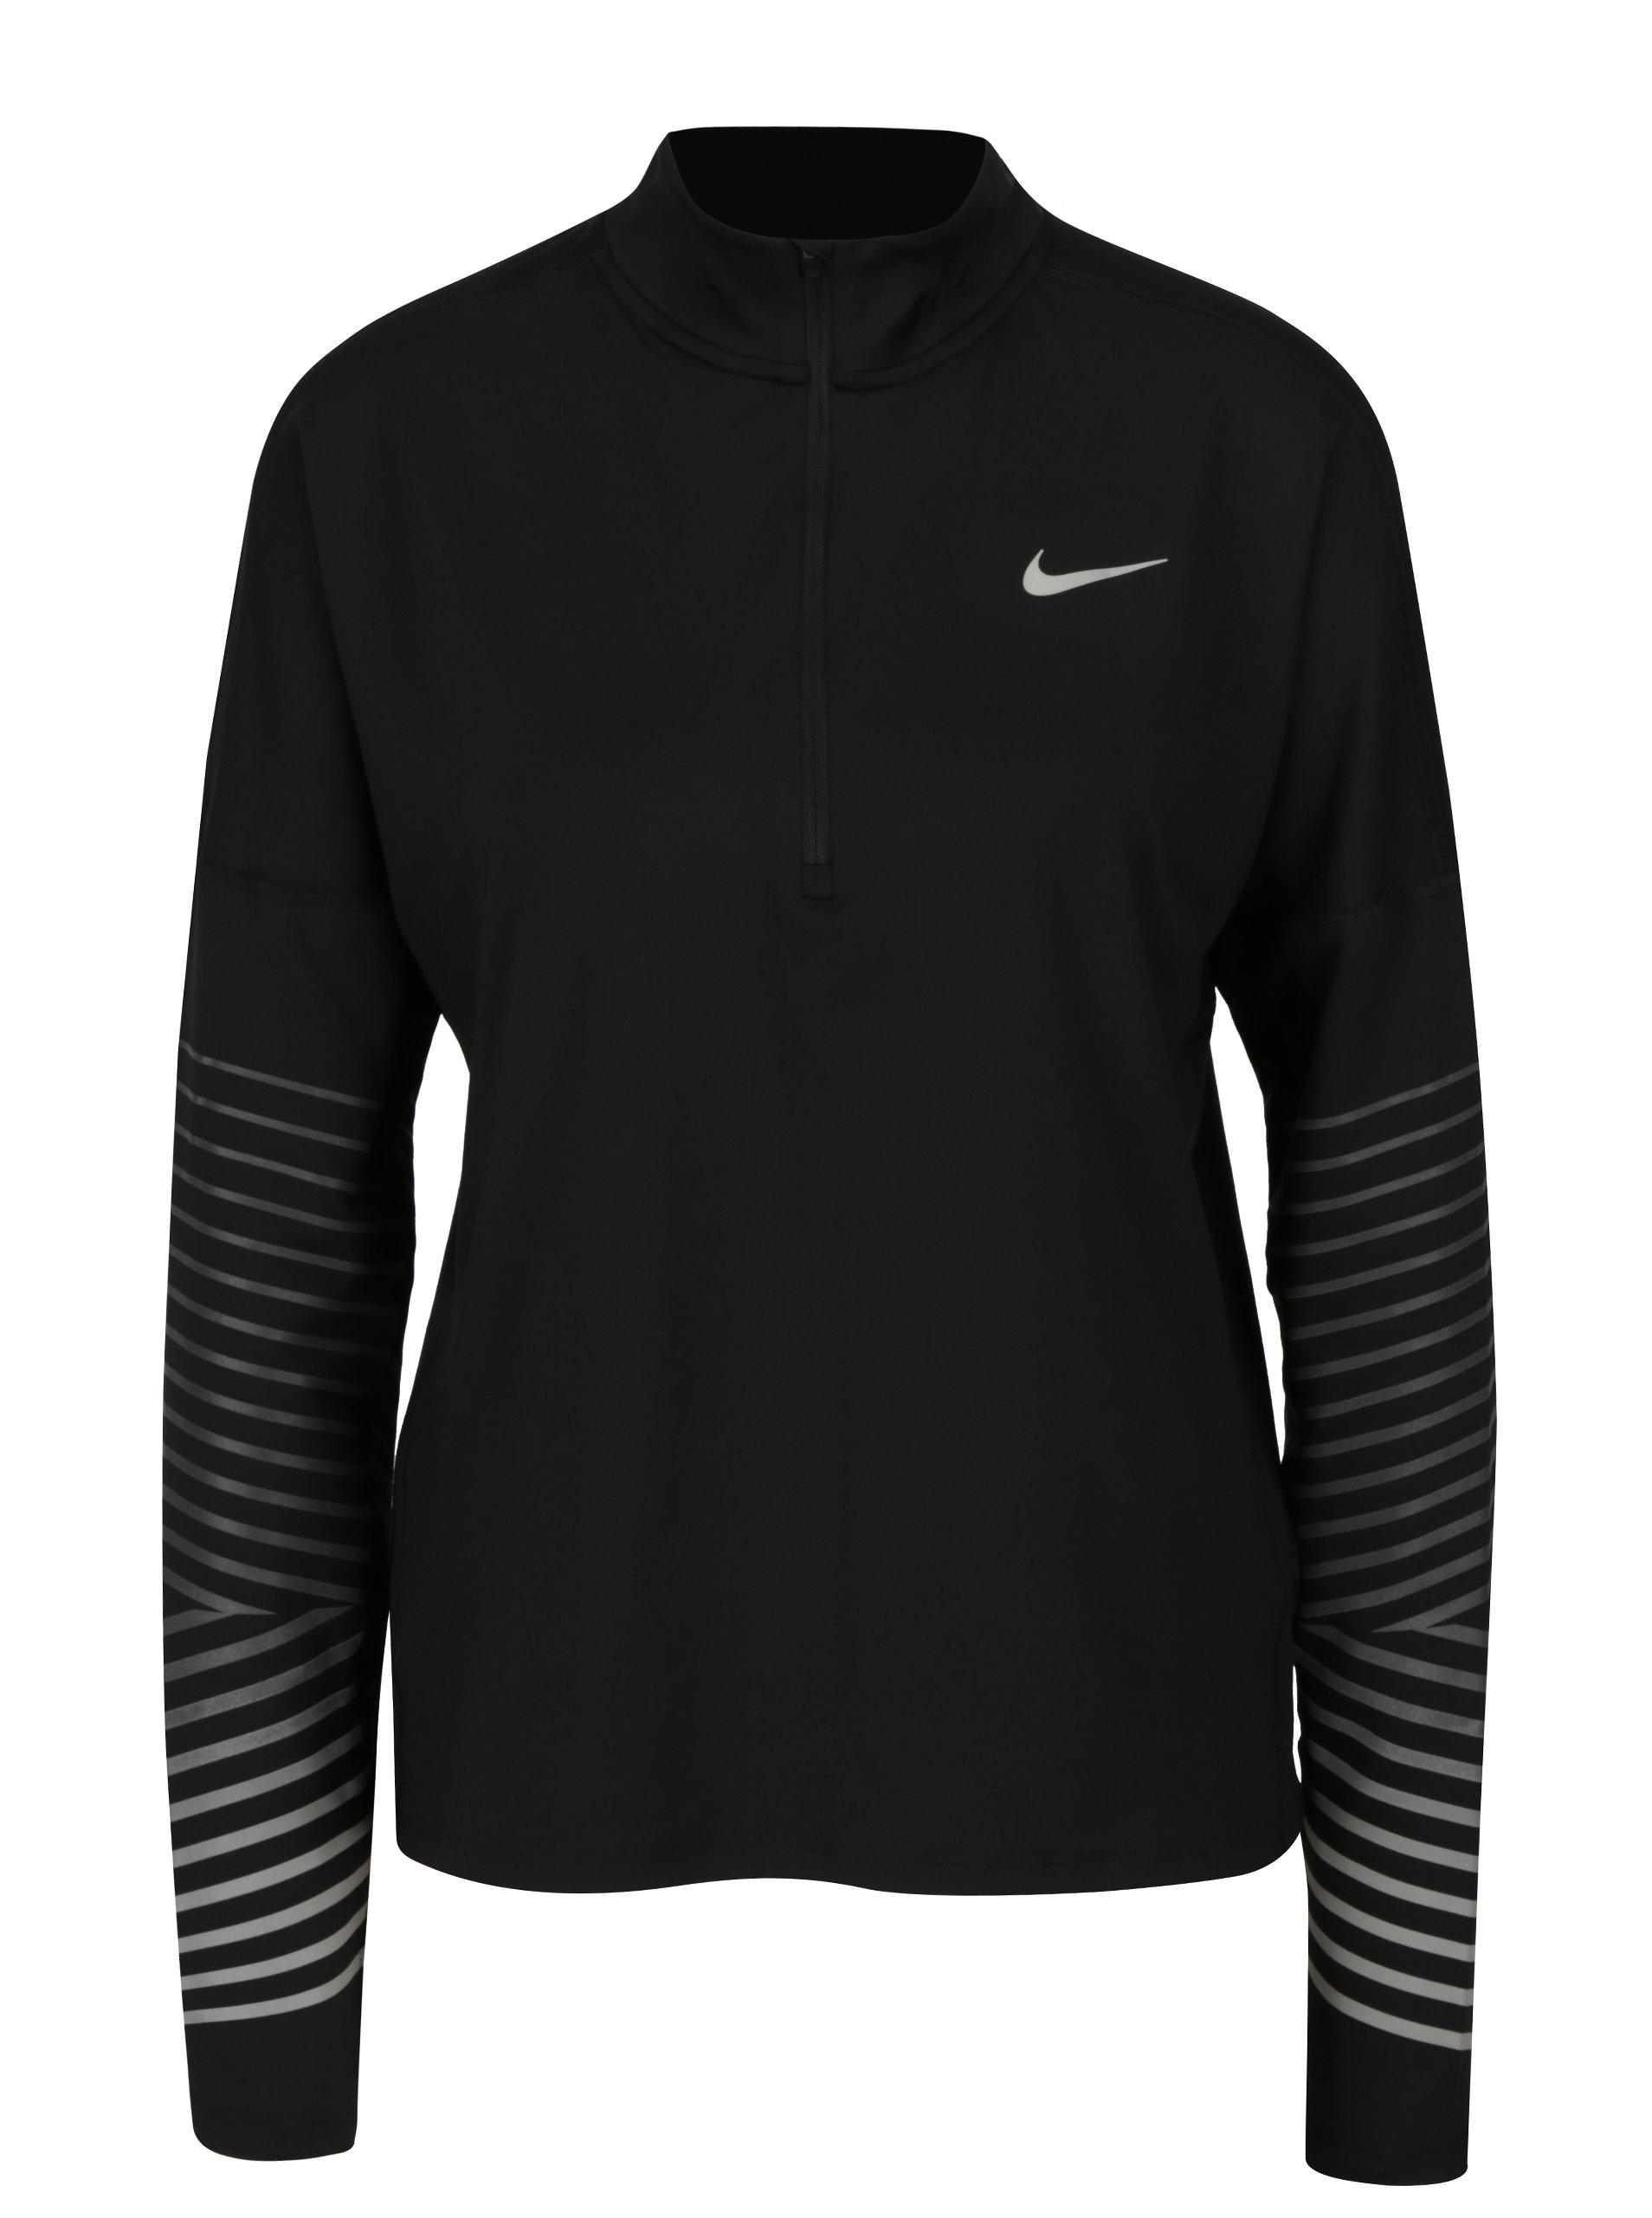 4c6361f3c9cf Čierne dámske funkčné tričko s dlhým rukávom Nike Element Flash ...